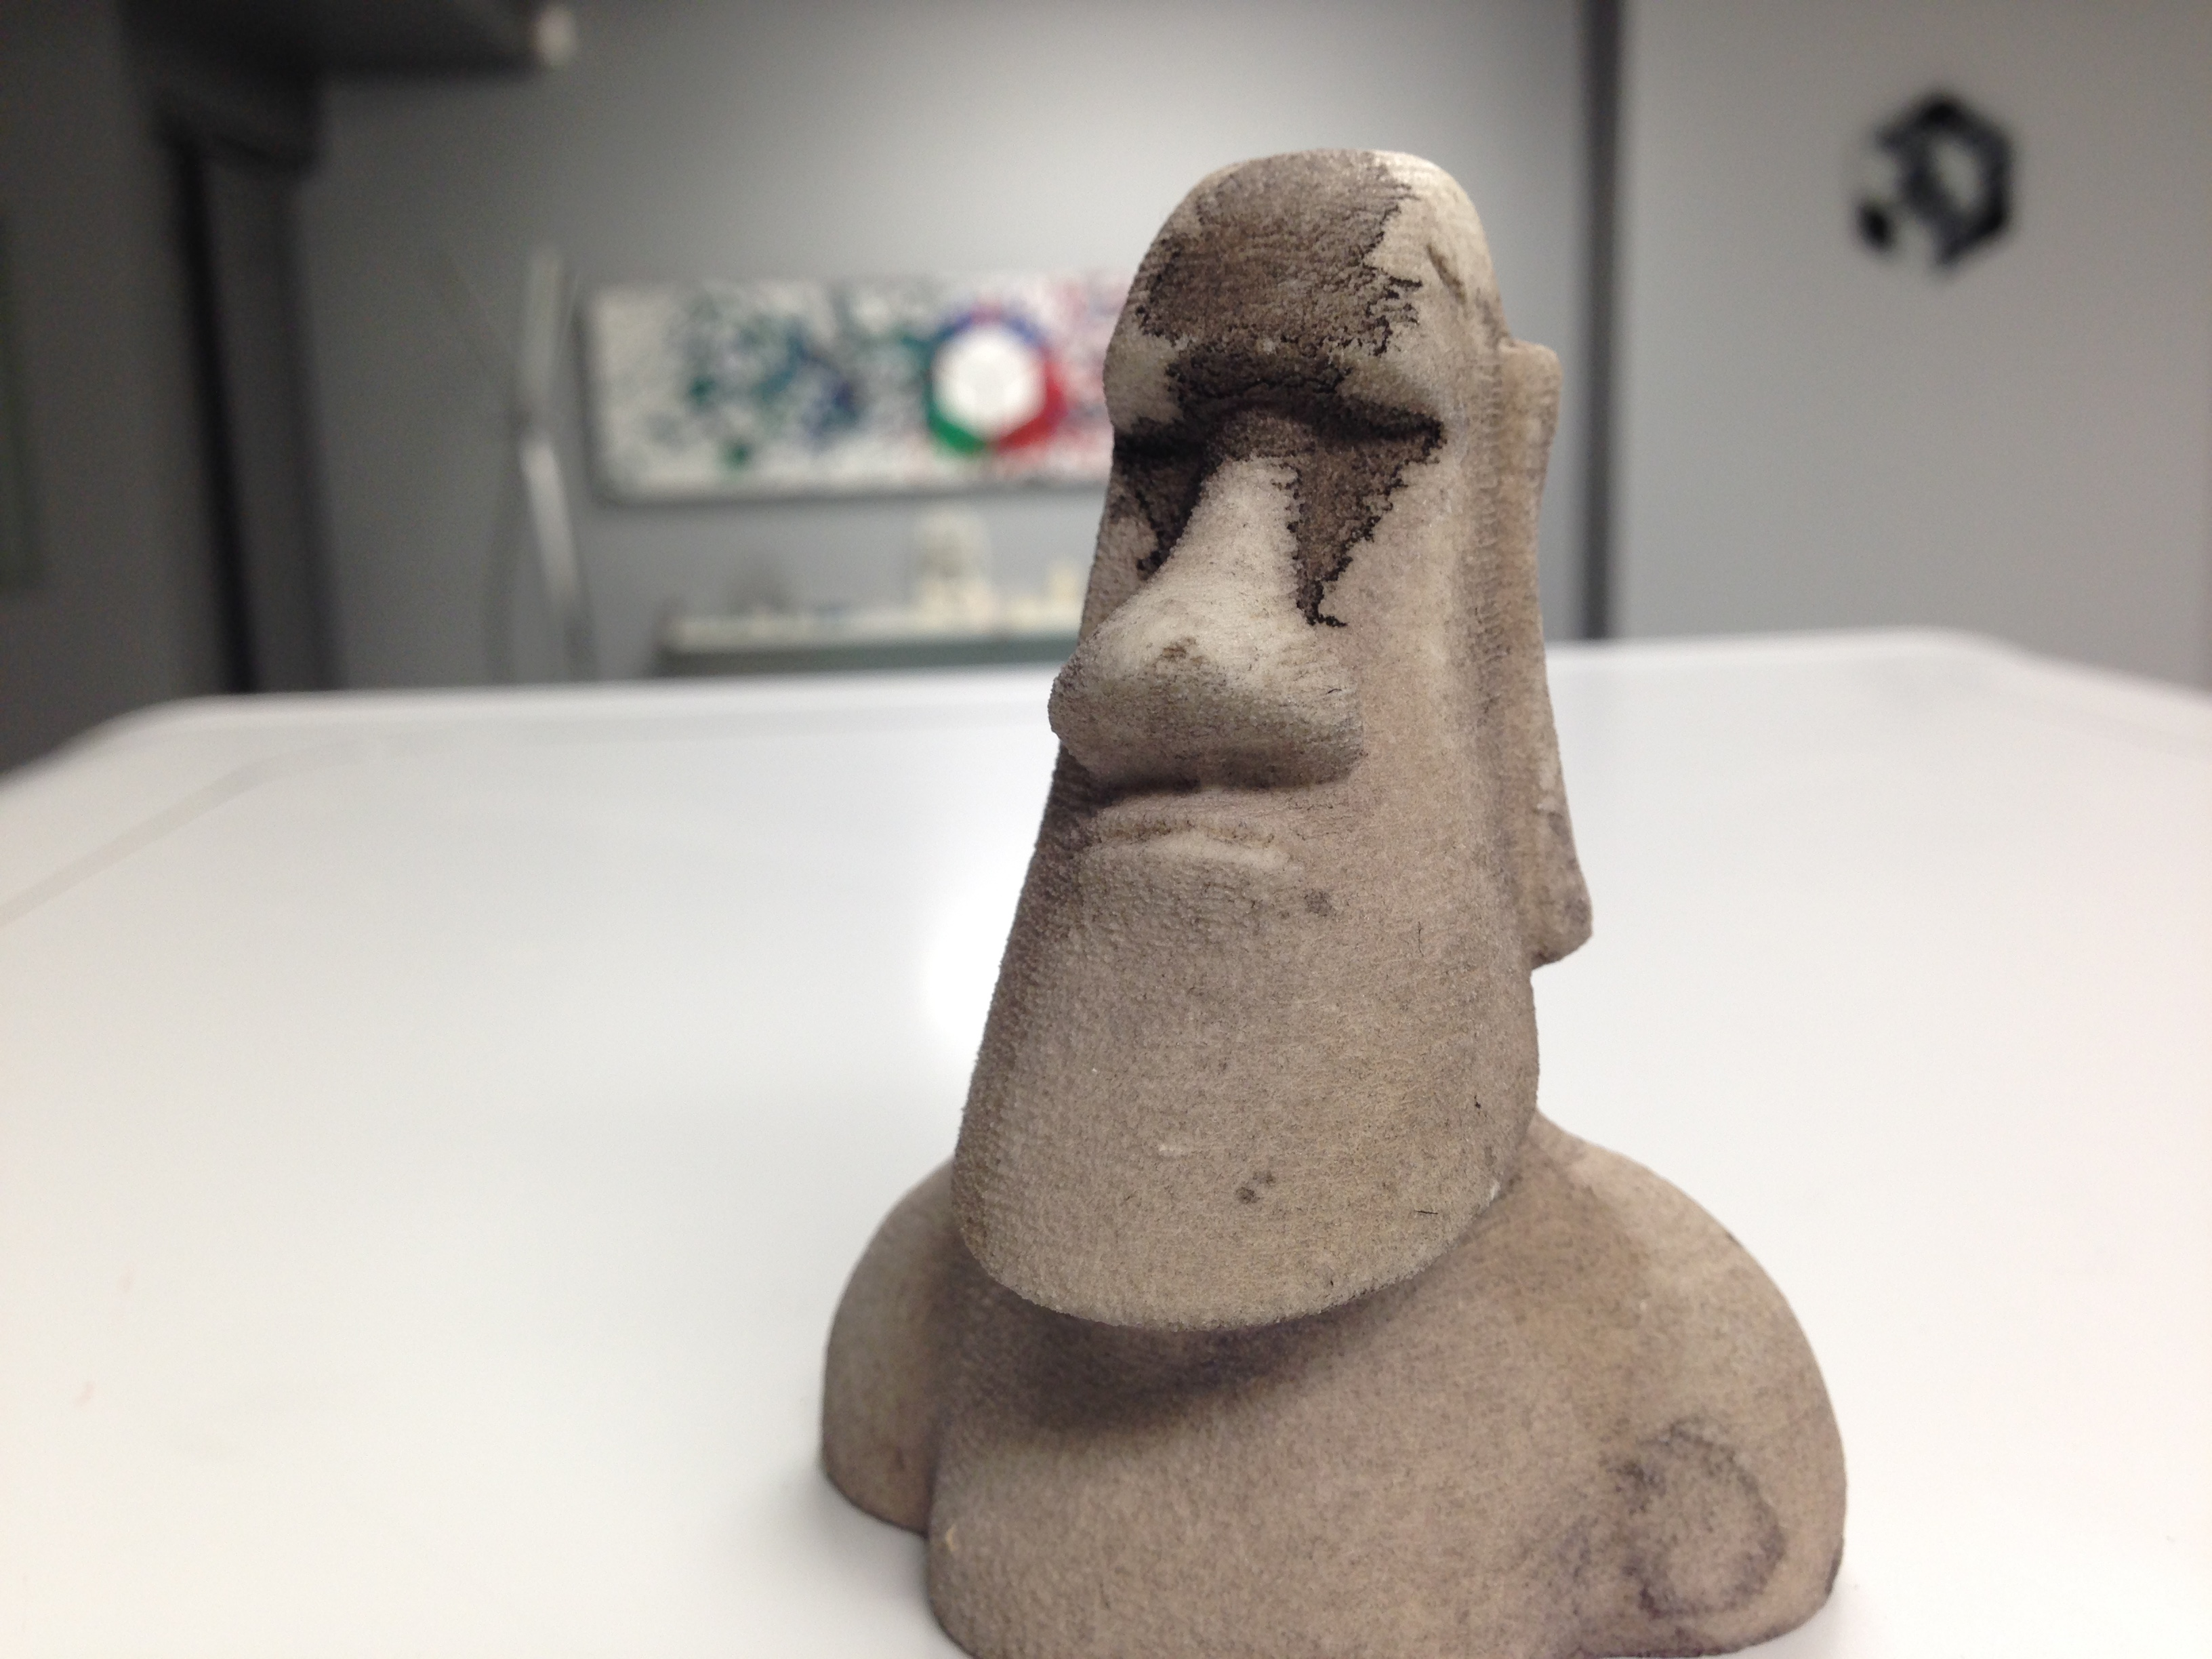 Dyed Moai statue